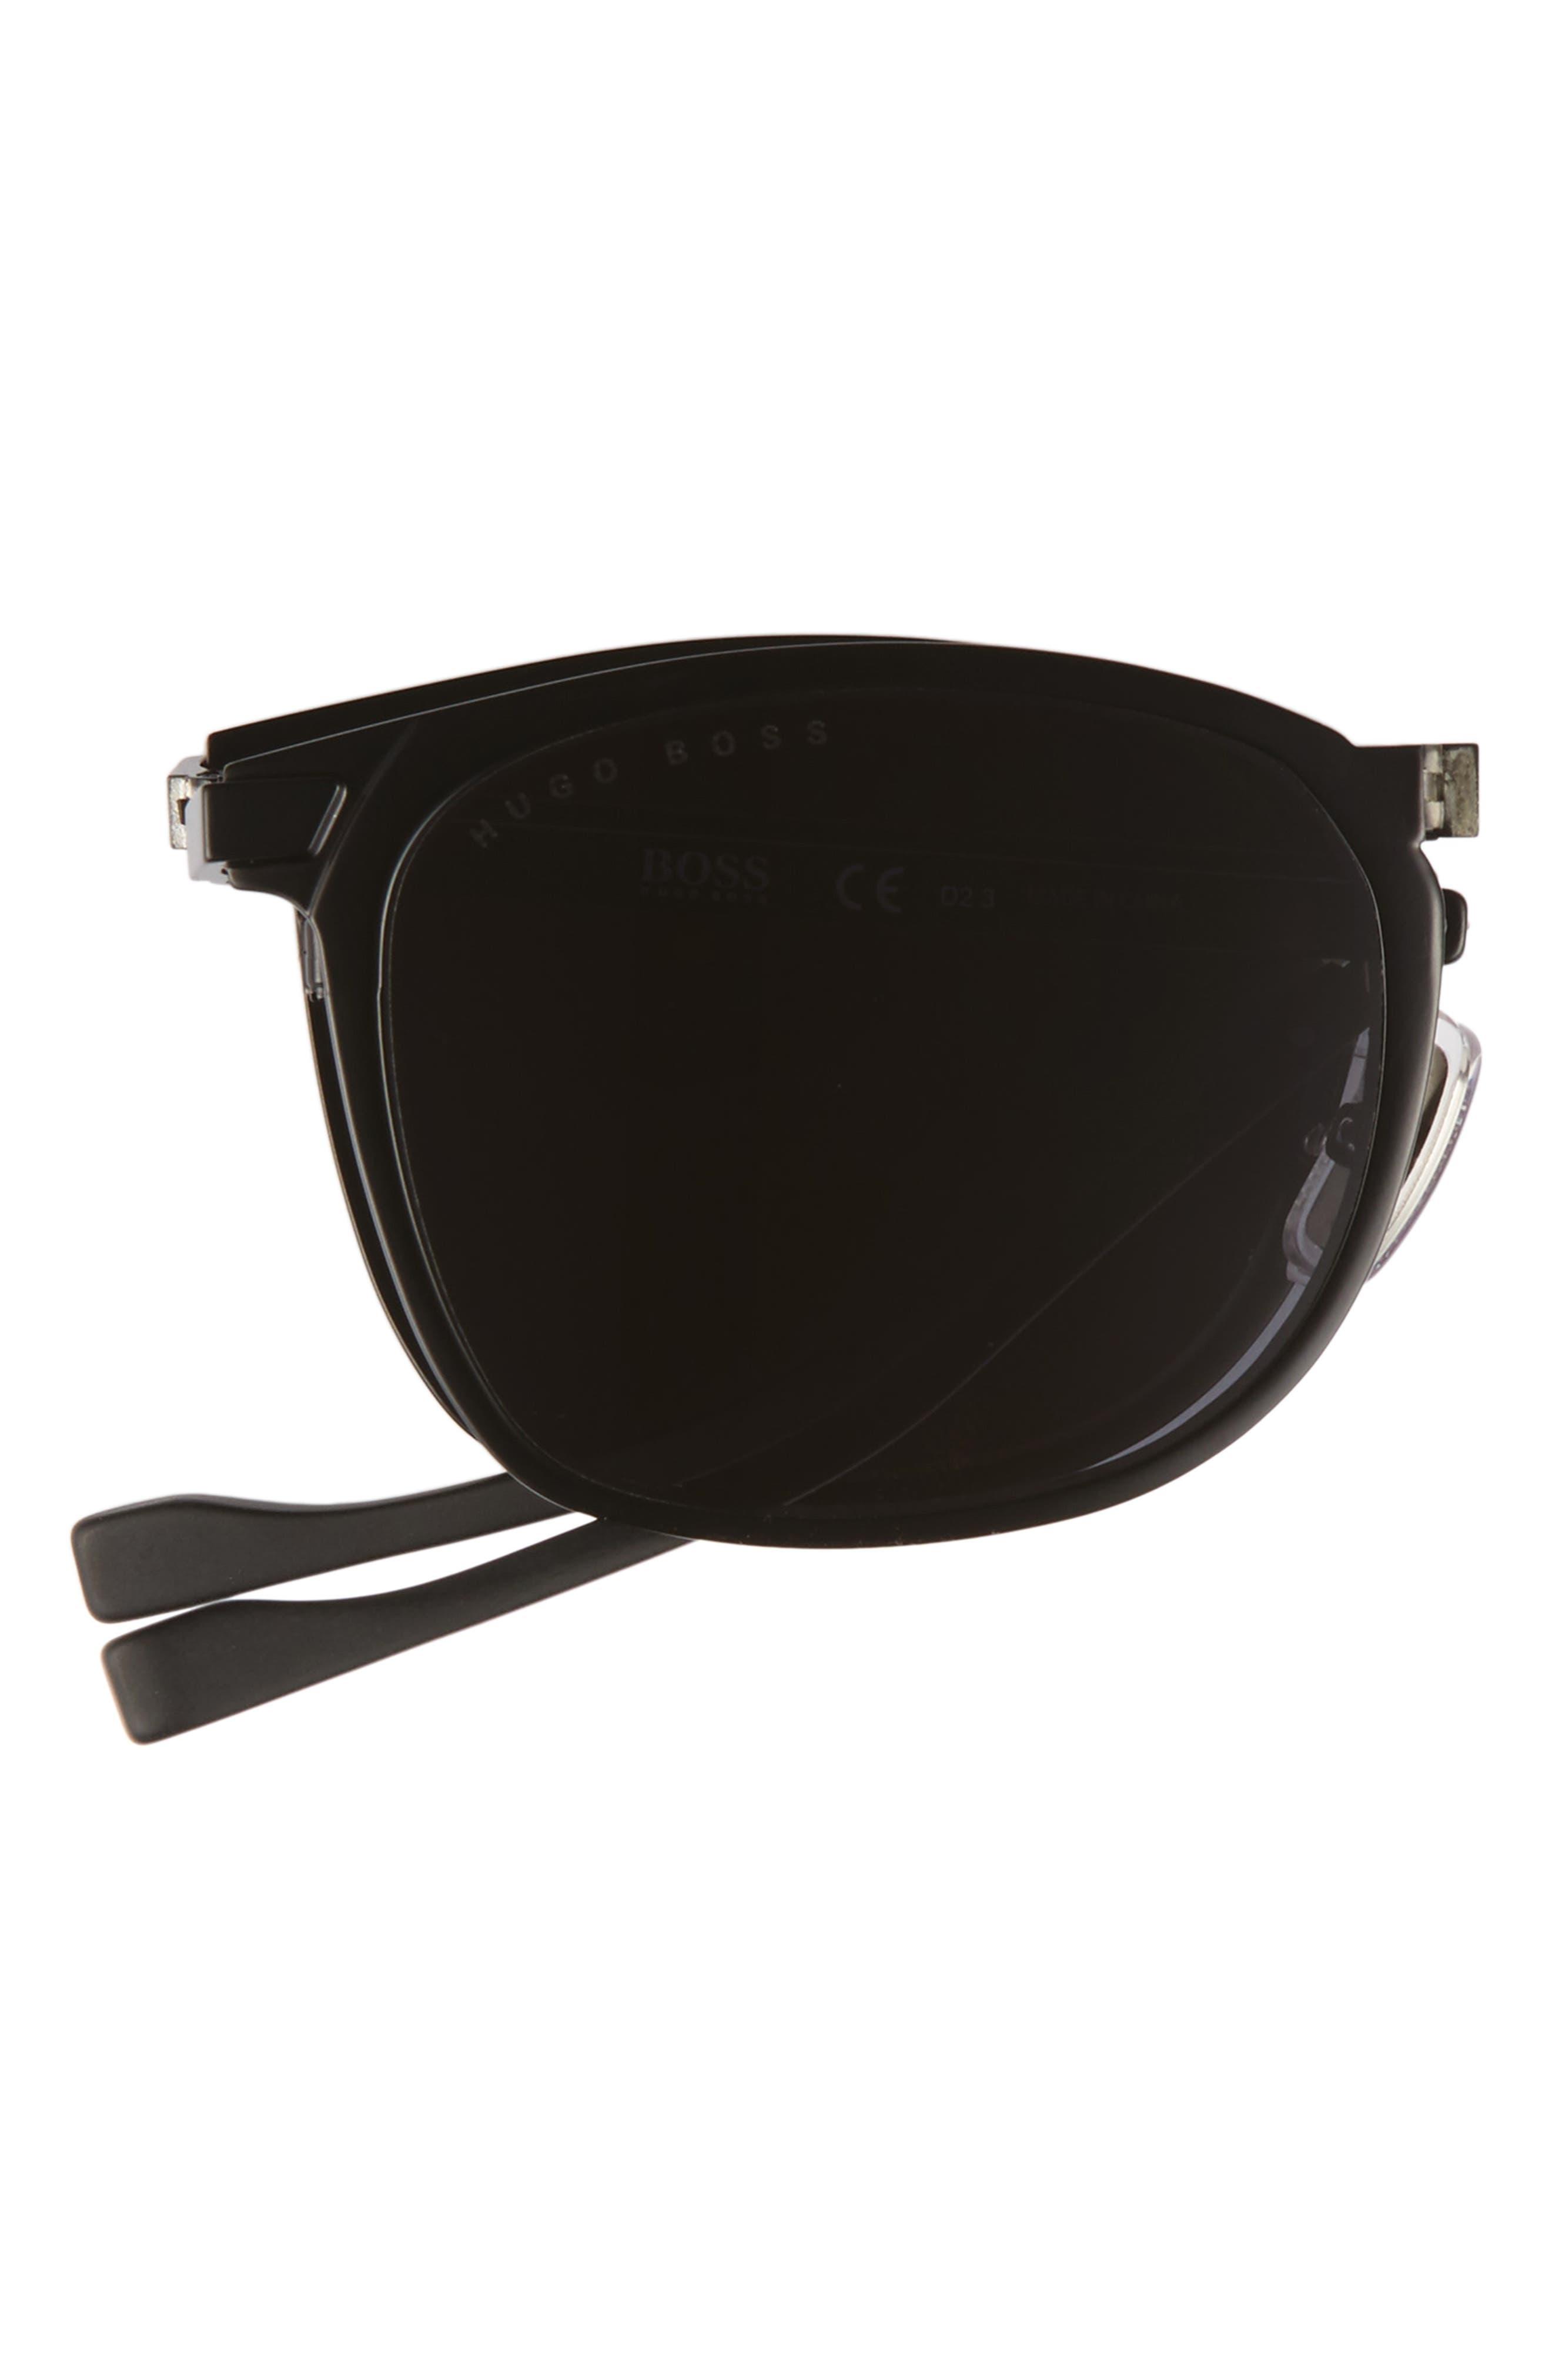 53mm Sunglasses,                             Alternate thumbnail 3, color,                             Matte Black/ Gray